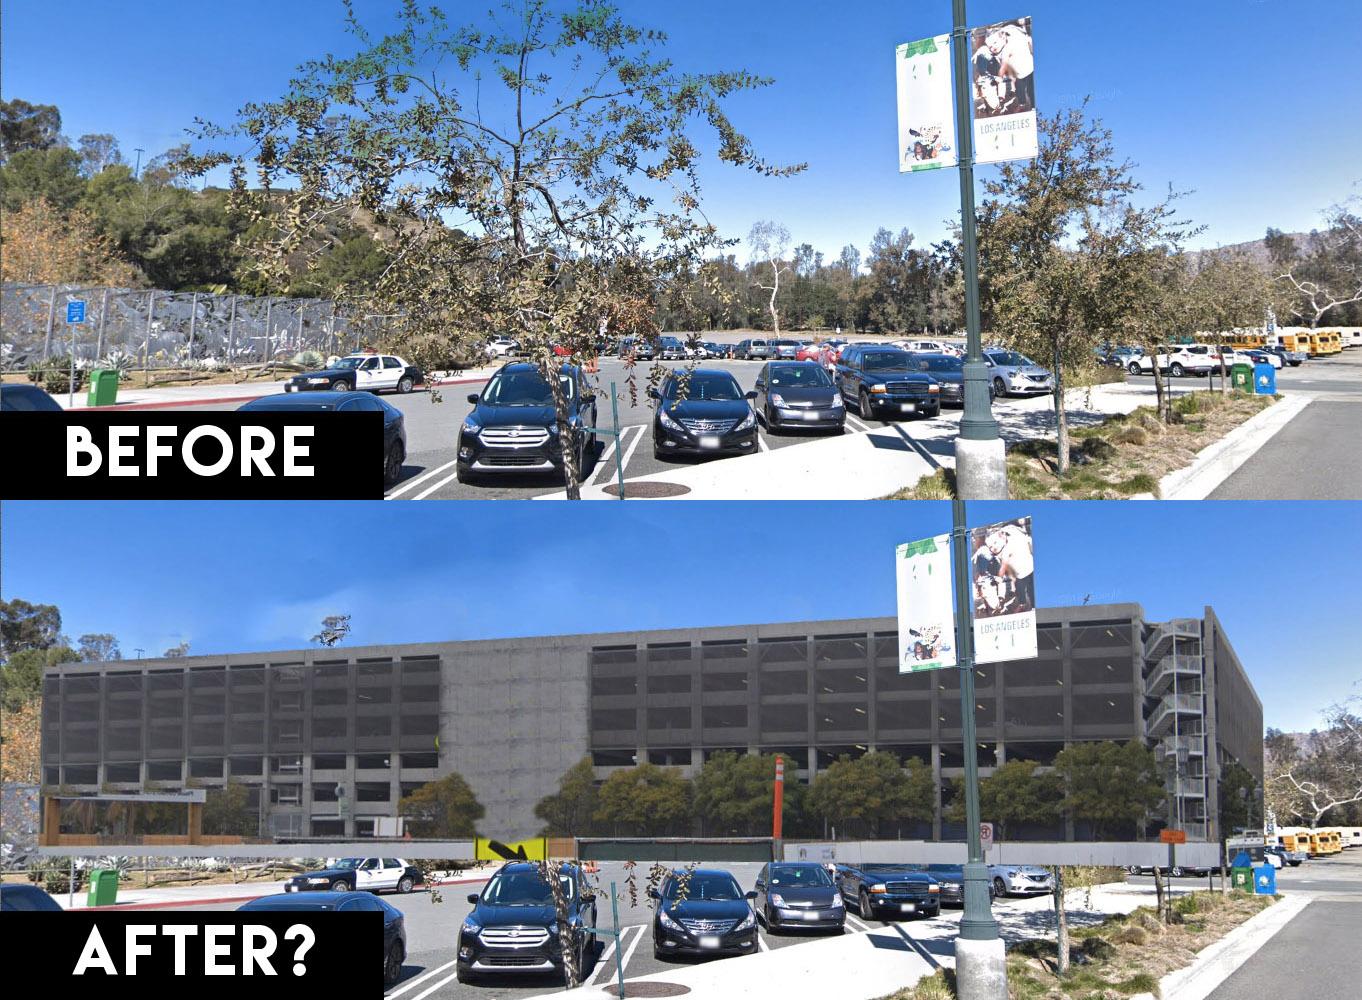 La Zoo Master Plan Prioritizing Parking Pollution Ciclavalley